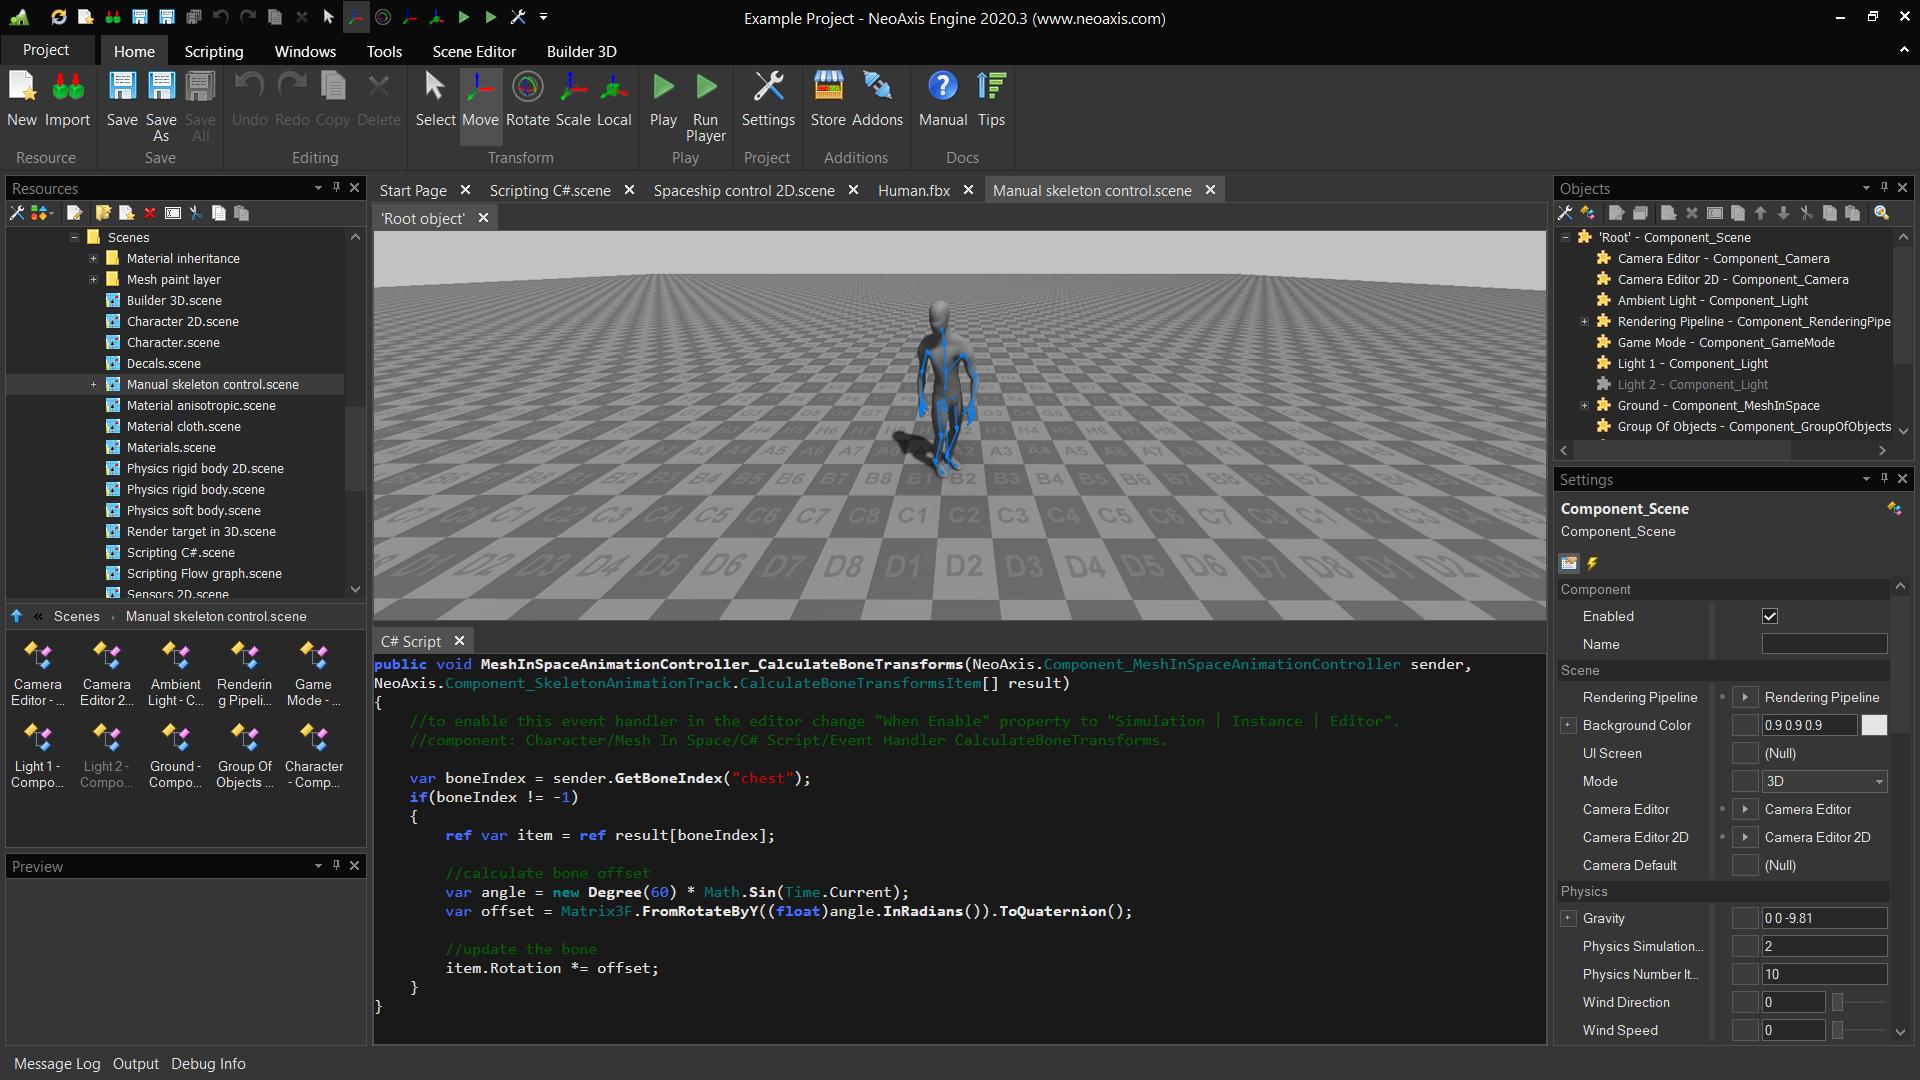 NeoAxis Engine Manual Skeleton Control | NeoAxis Engine, 3D/2D игровой движок, теперь Open Source